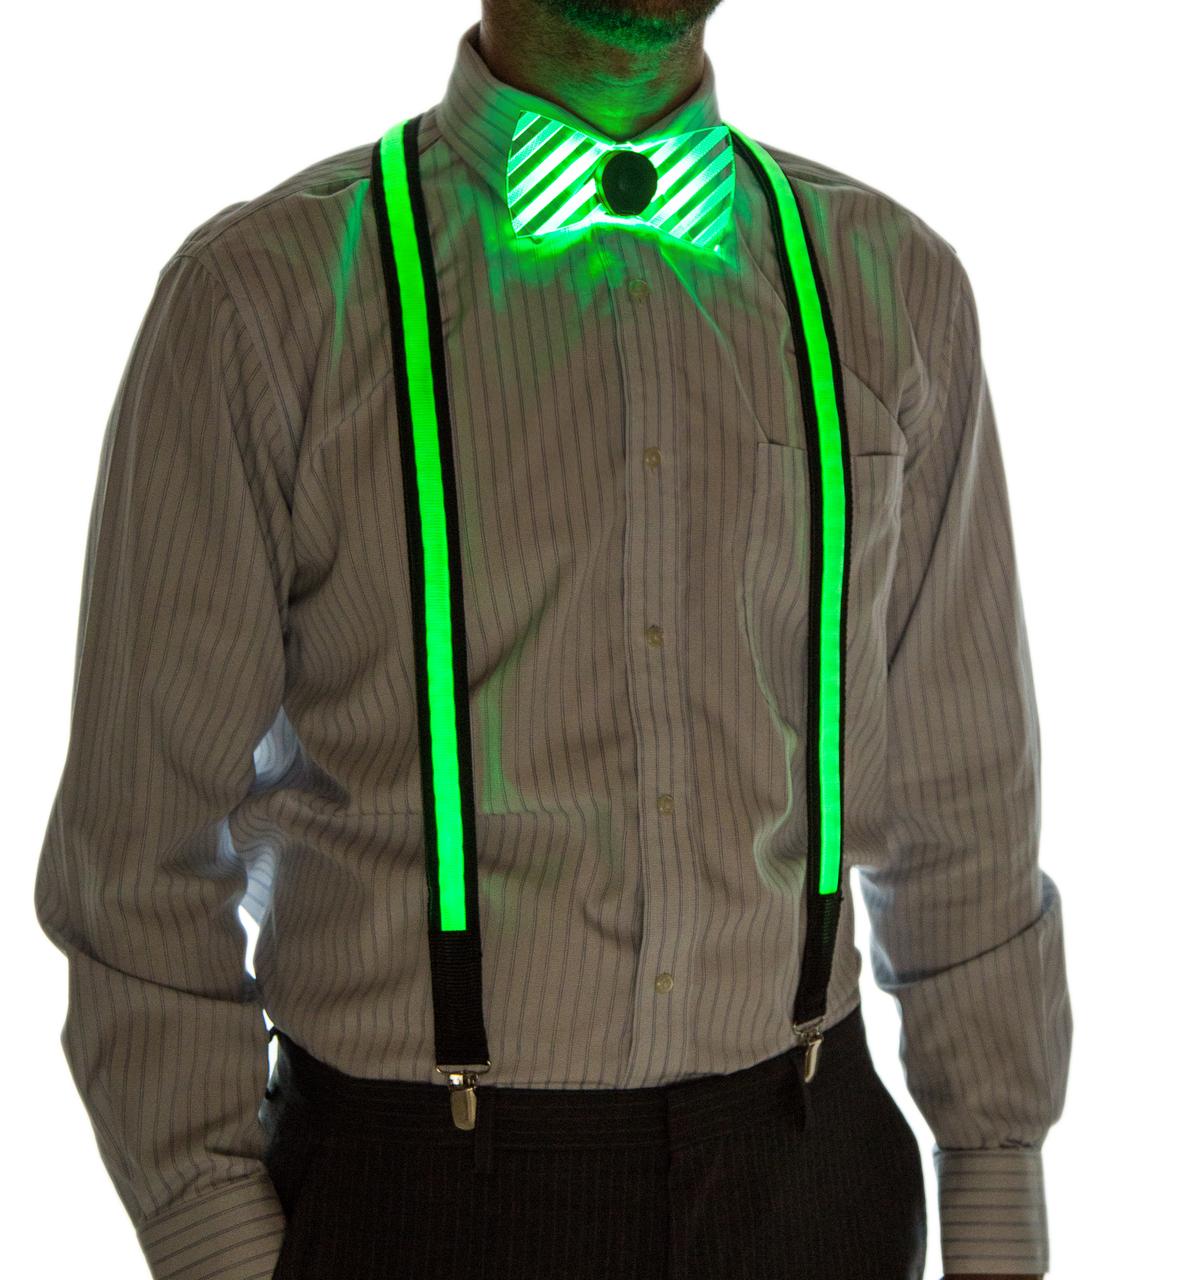 Light Up Suspenders Green on Model